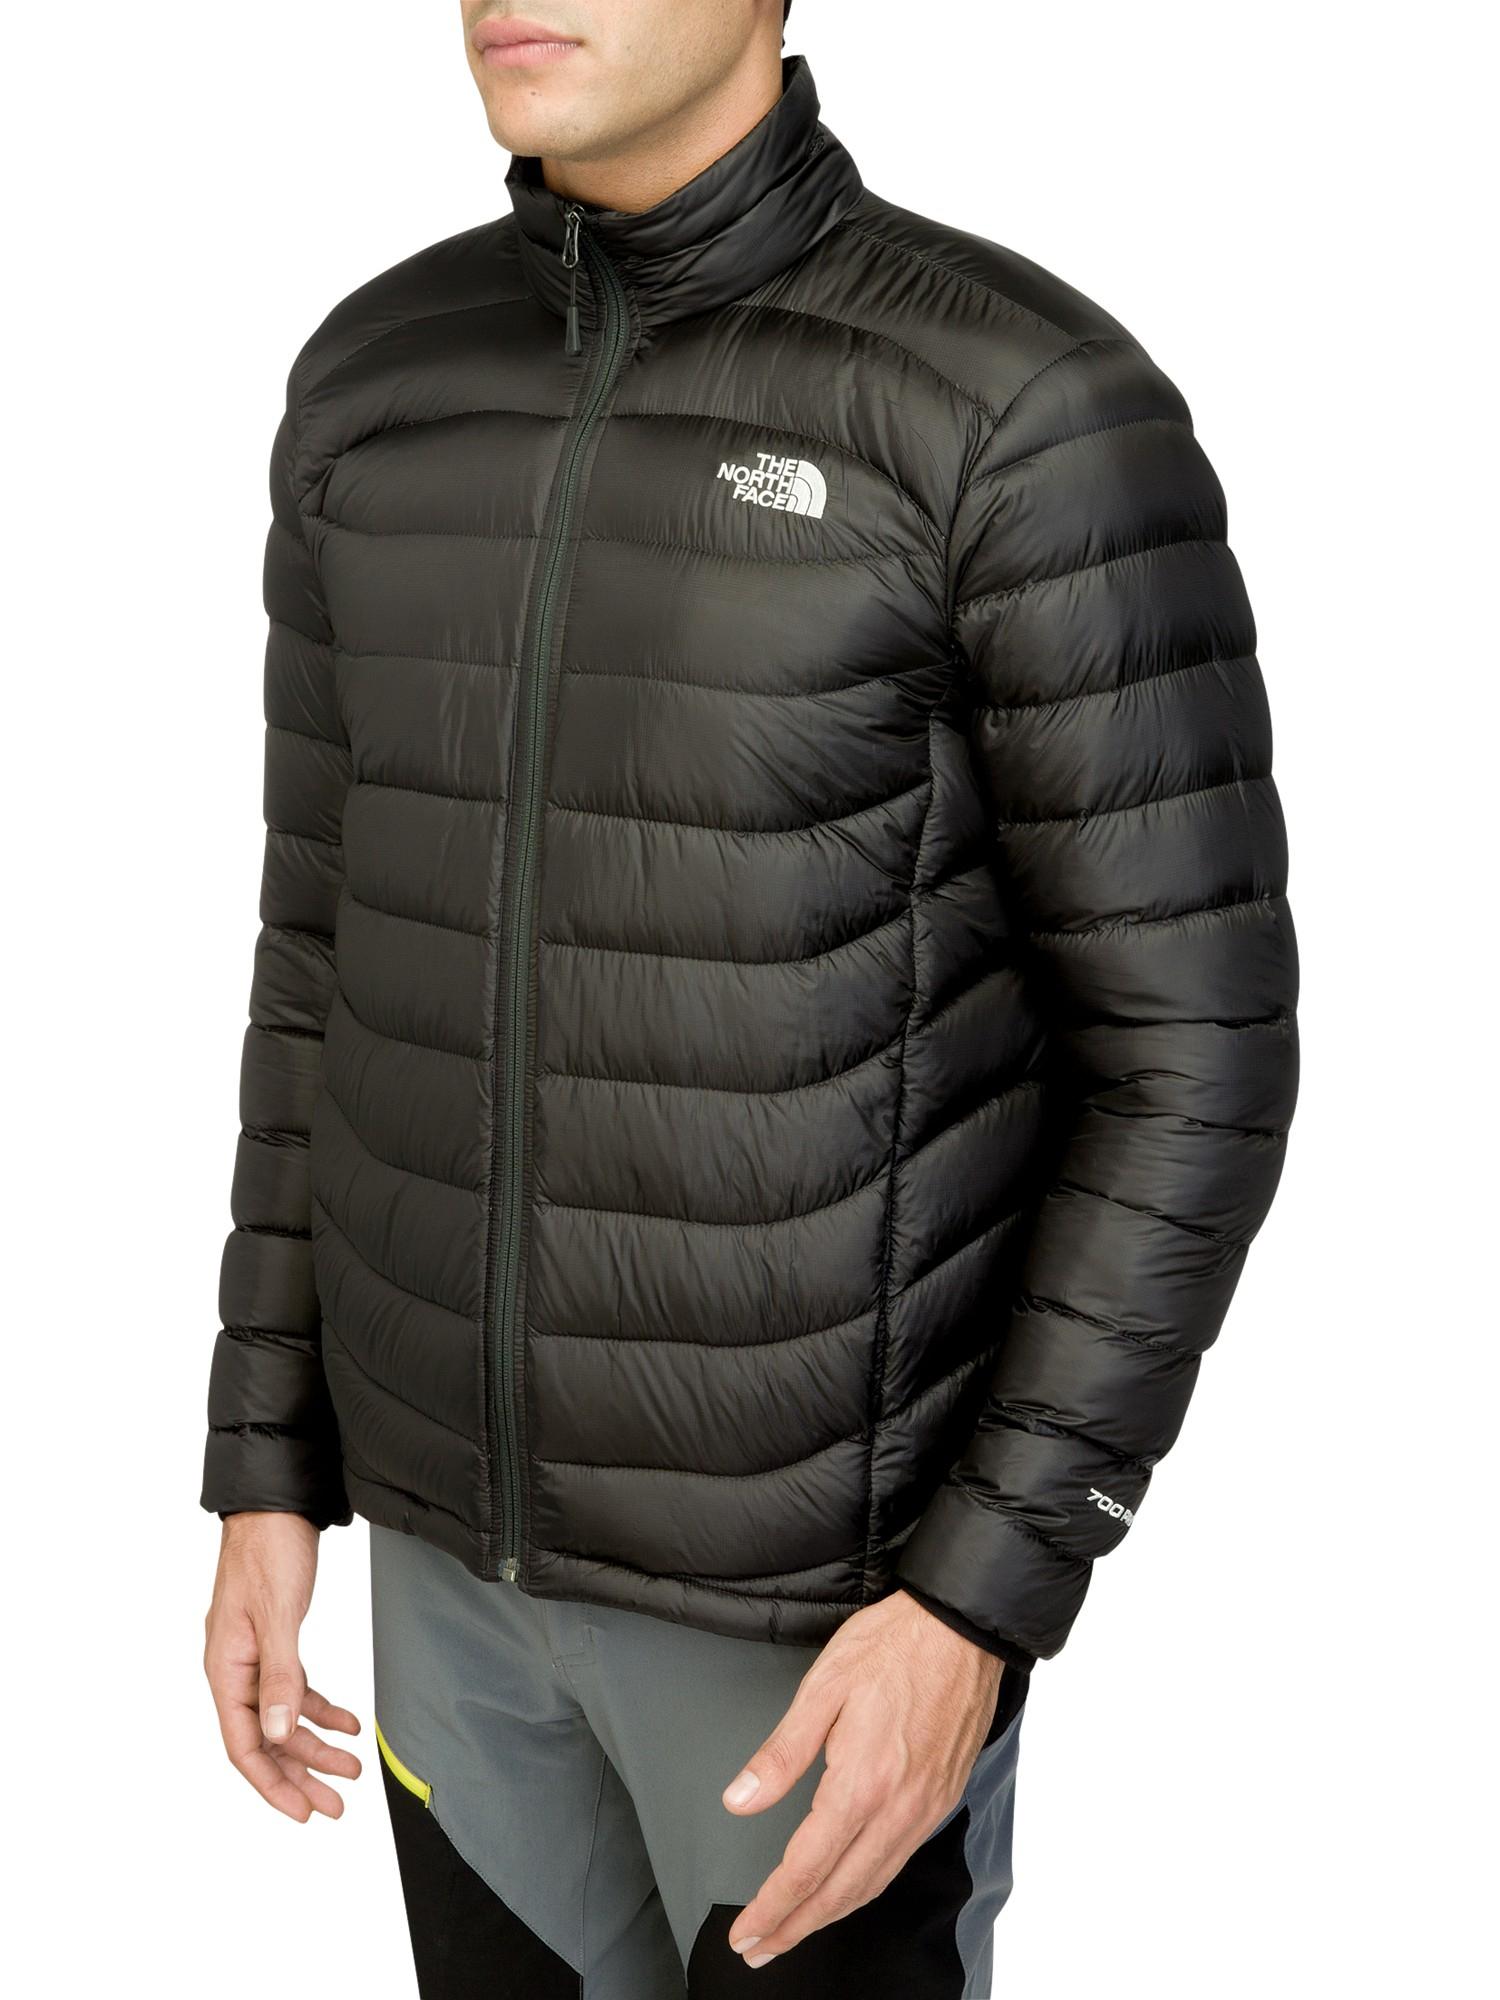 North Face Jackets Cheap